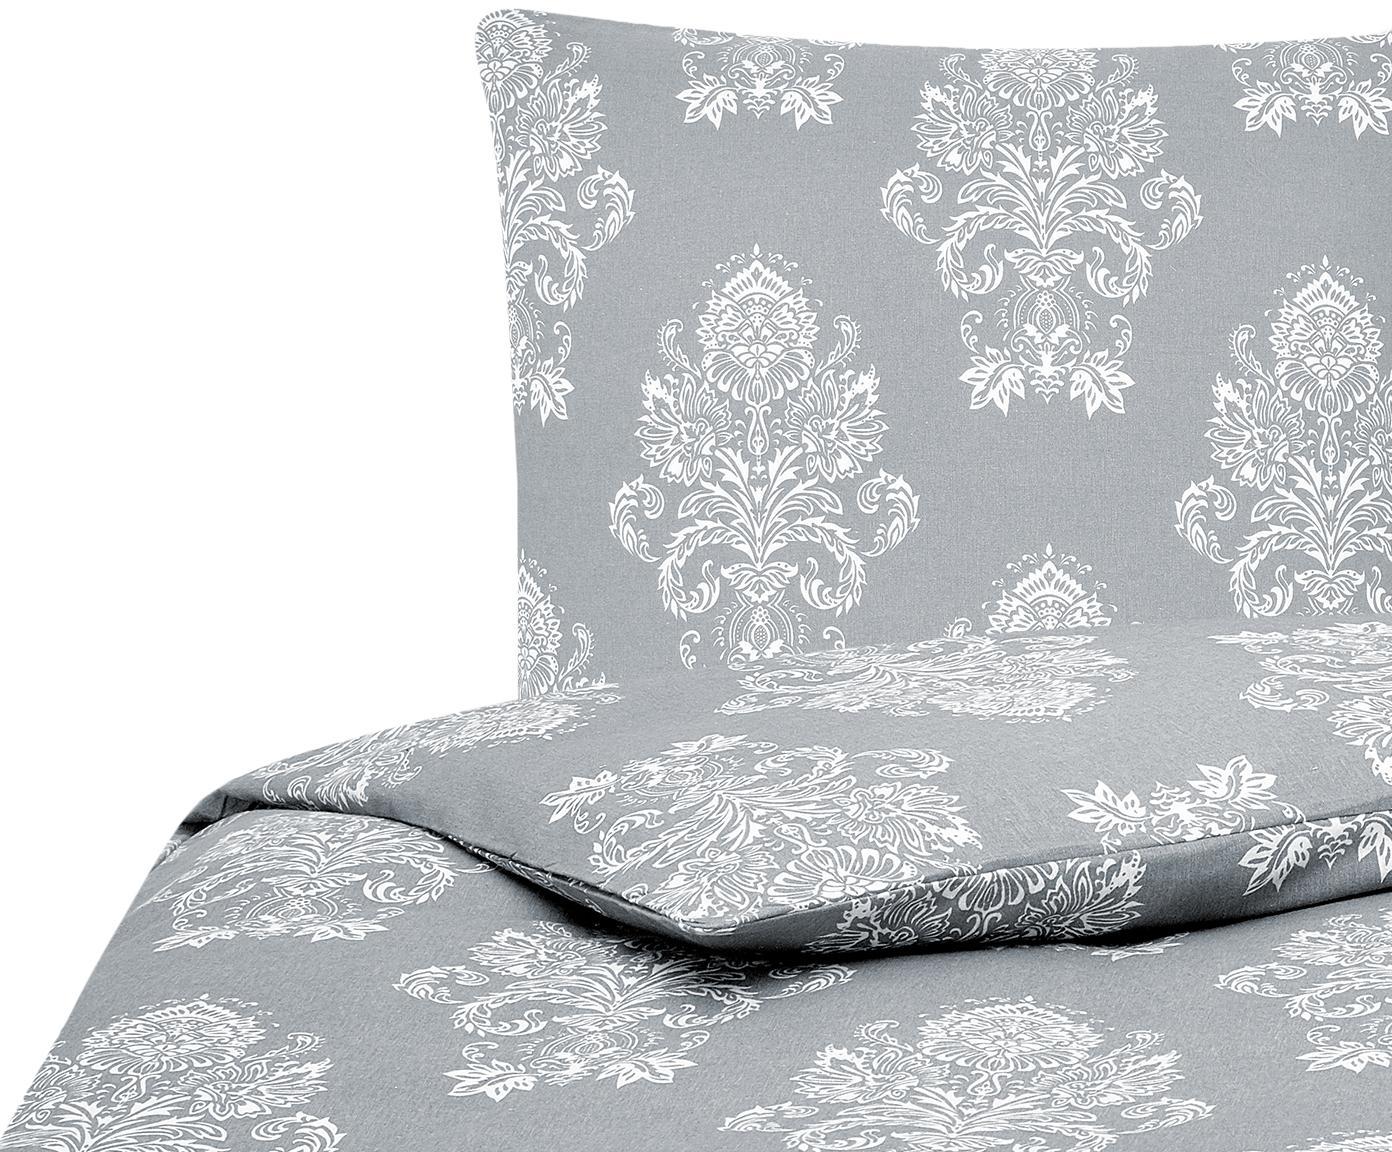 Flanell-Bettwäsche Sissi, gemustert, Webart: Flanell, Grau, Weiß, 135 x 200 cm